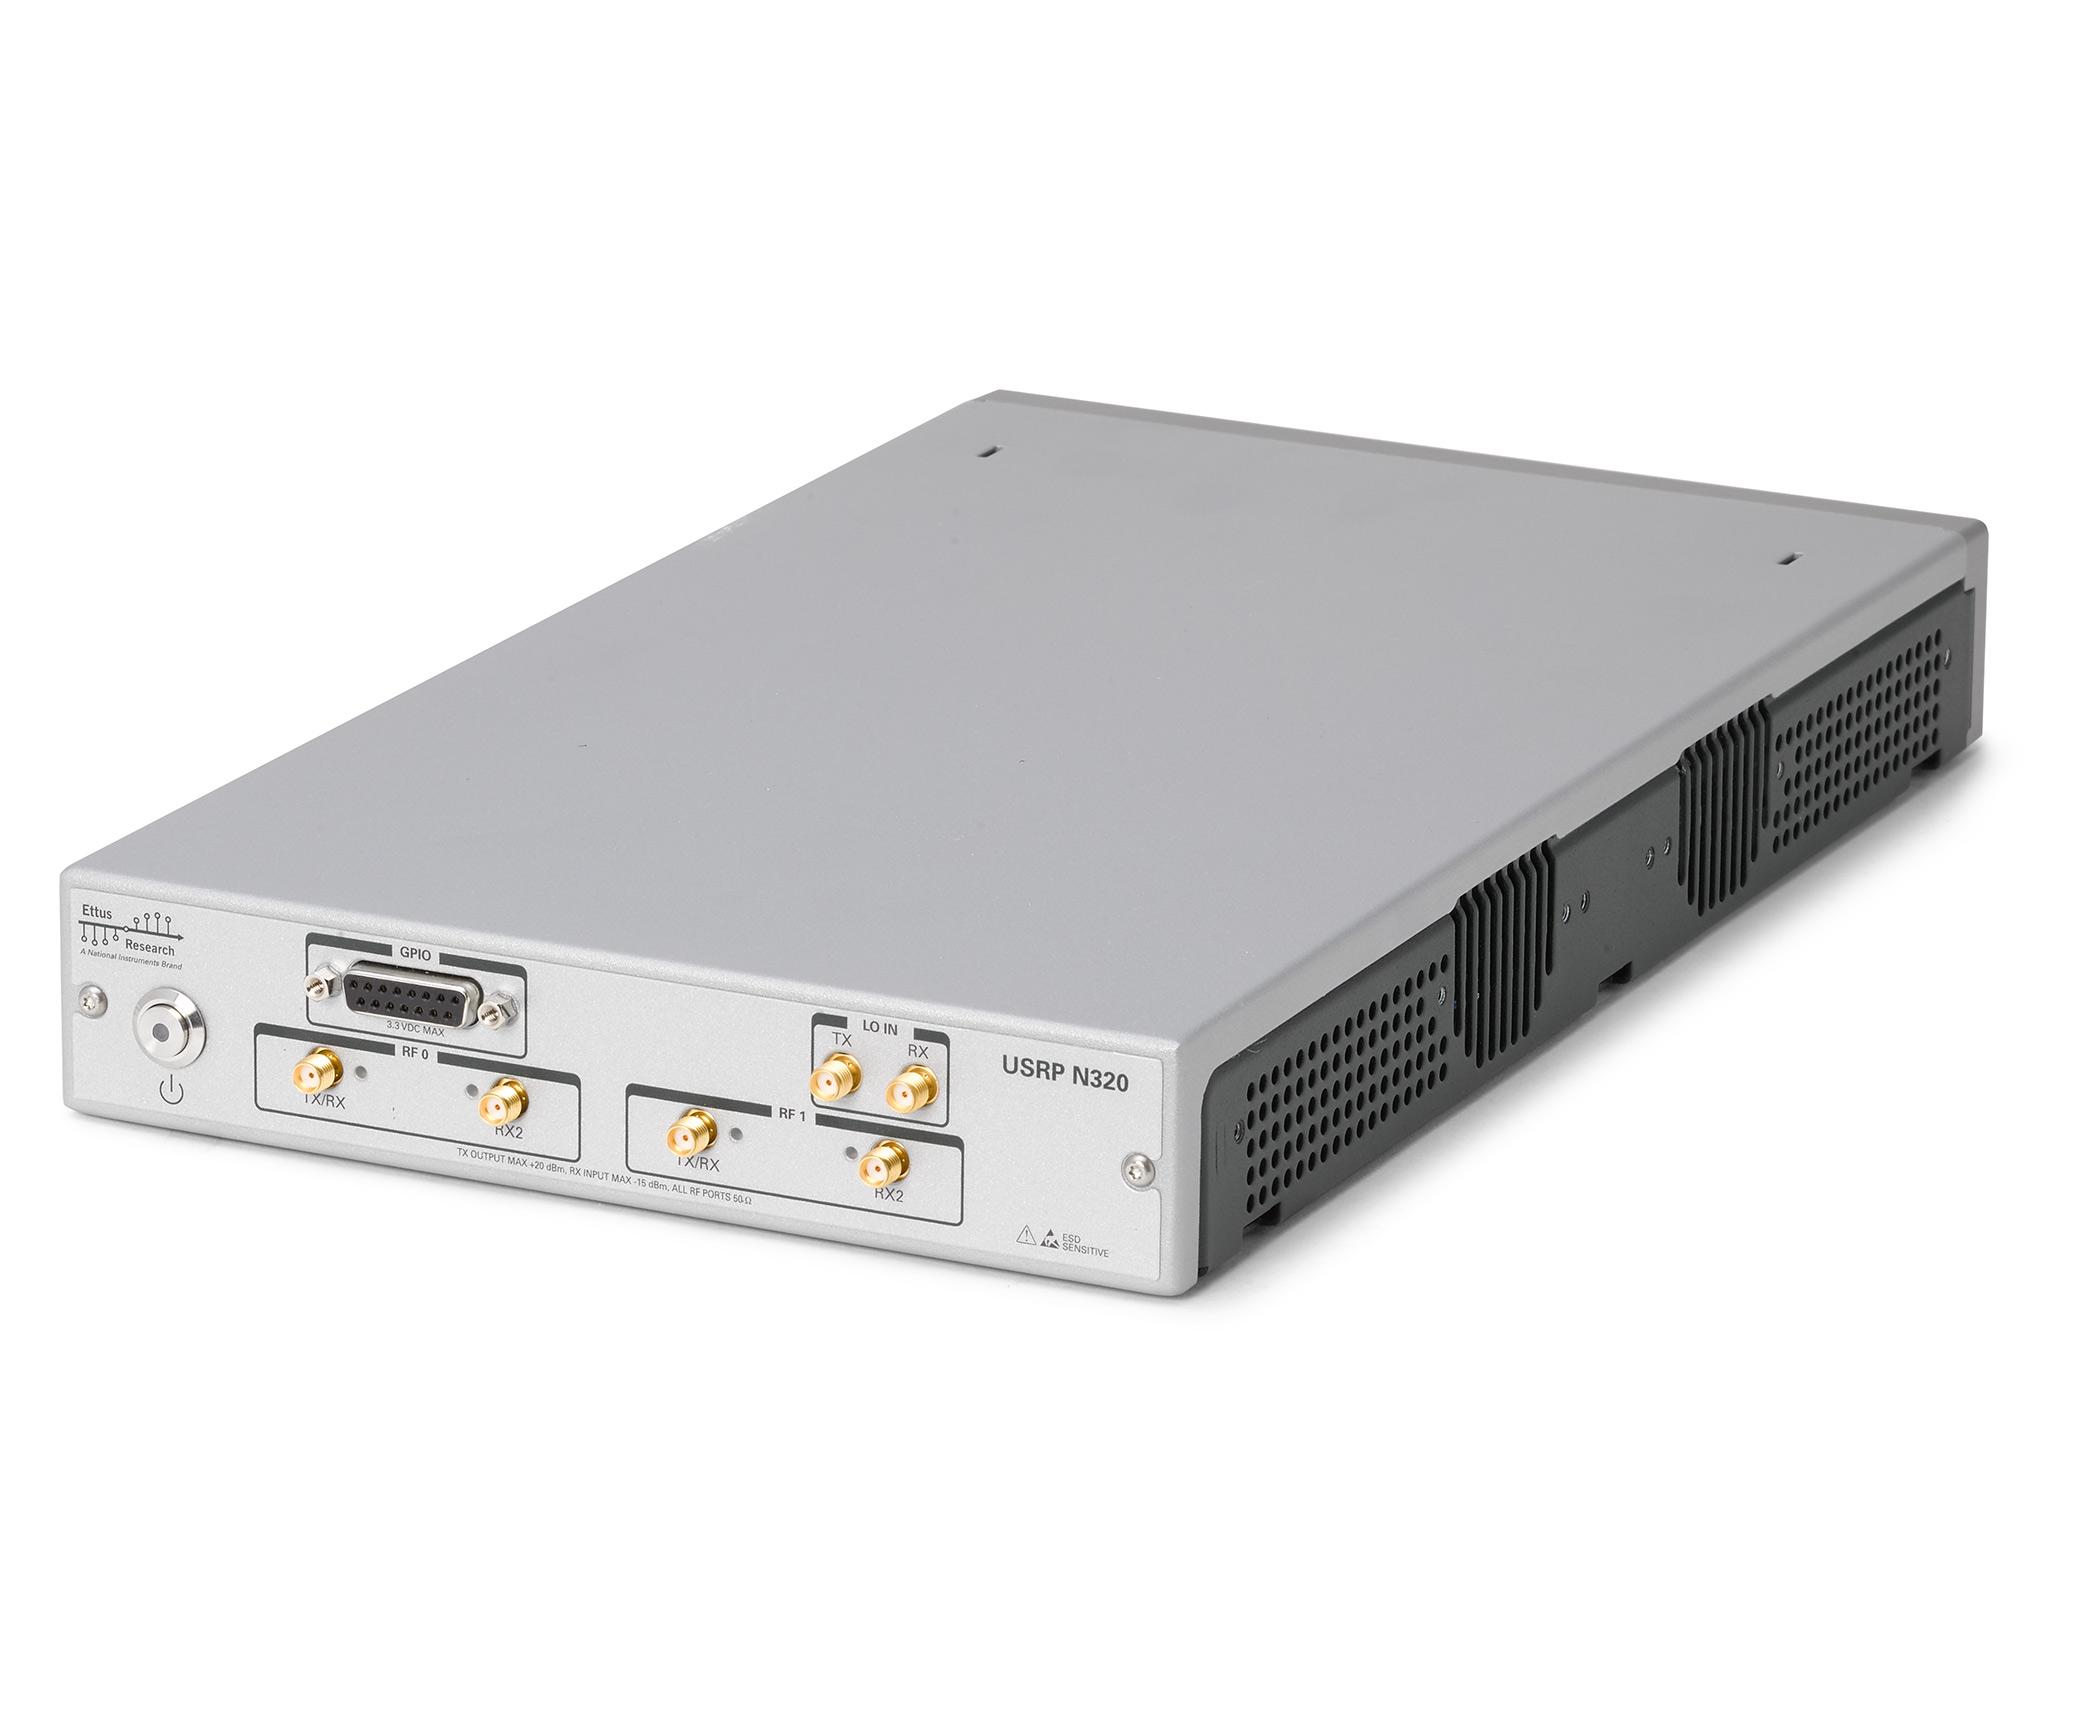 USRP N320